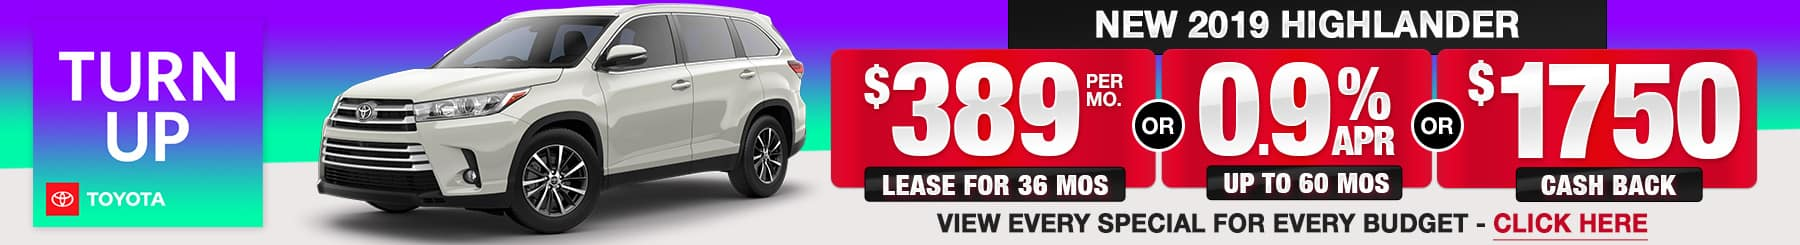 Toyota Highlander Lease Finance Specials